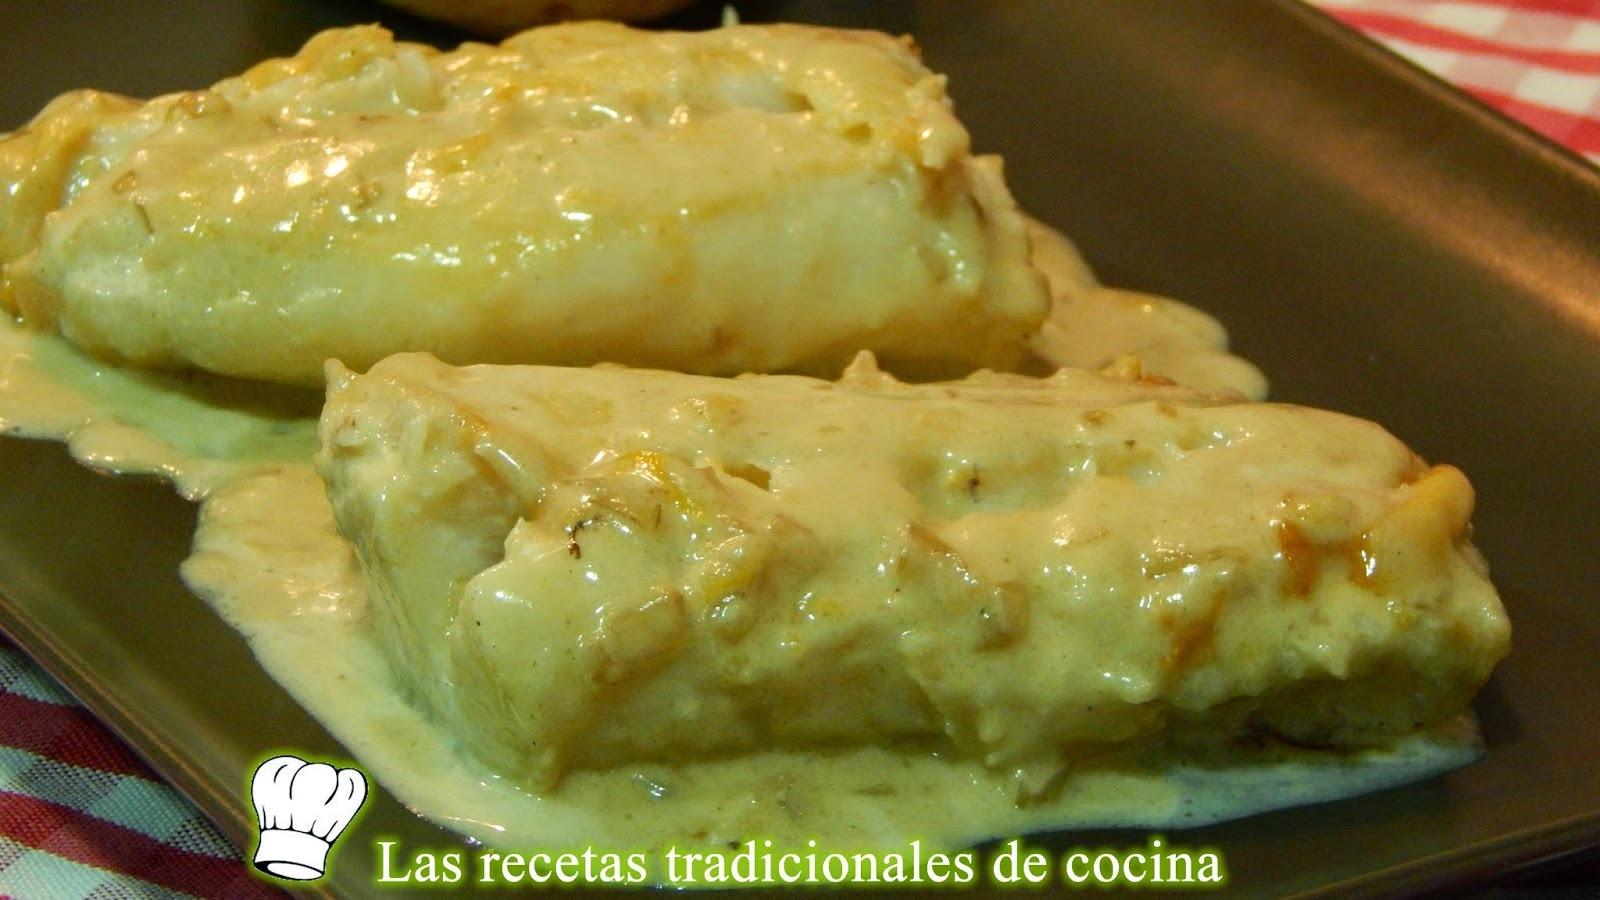 Receta fácil de bacalao a la crema con limón